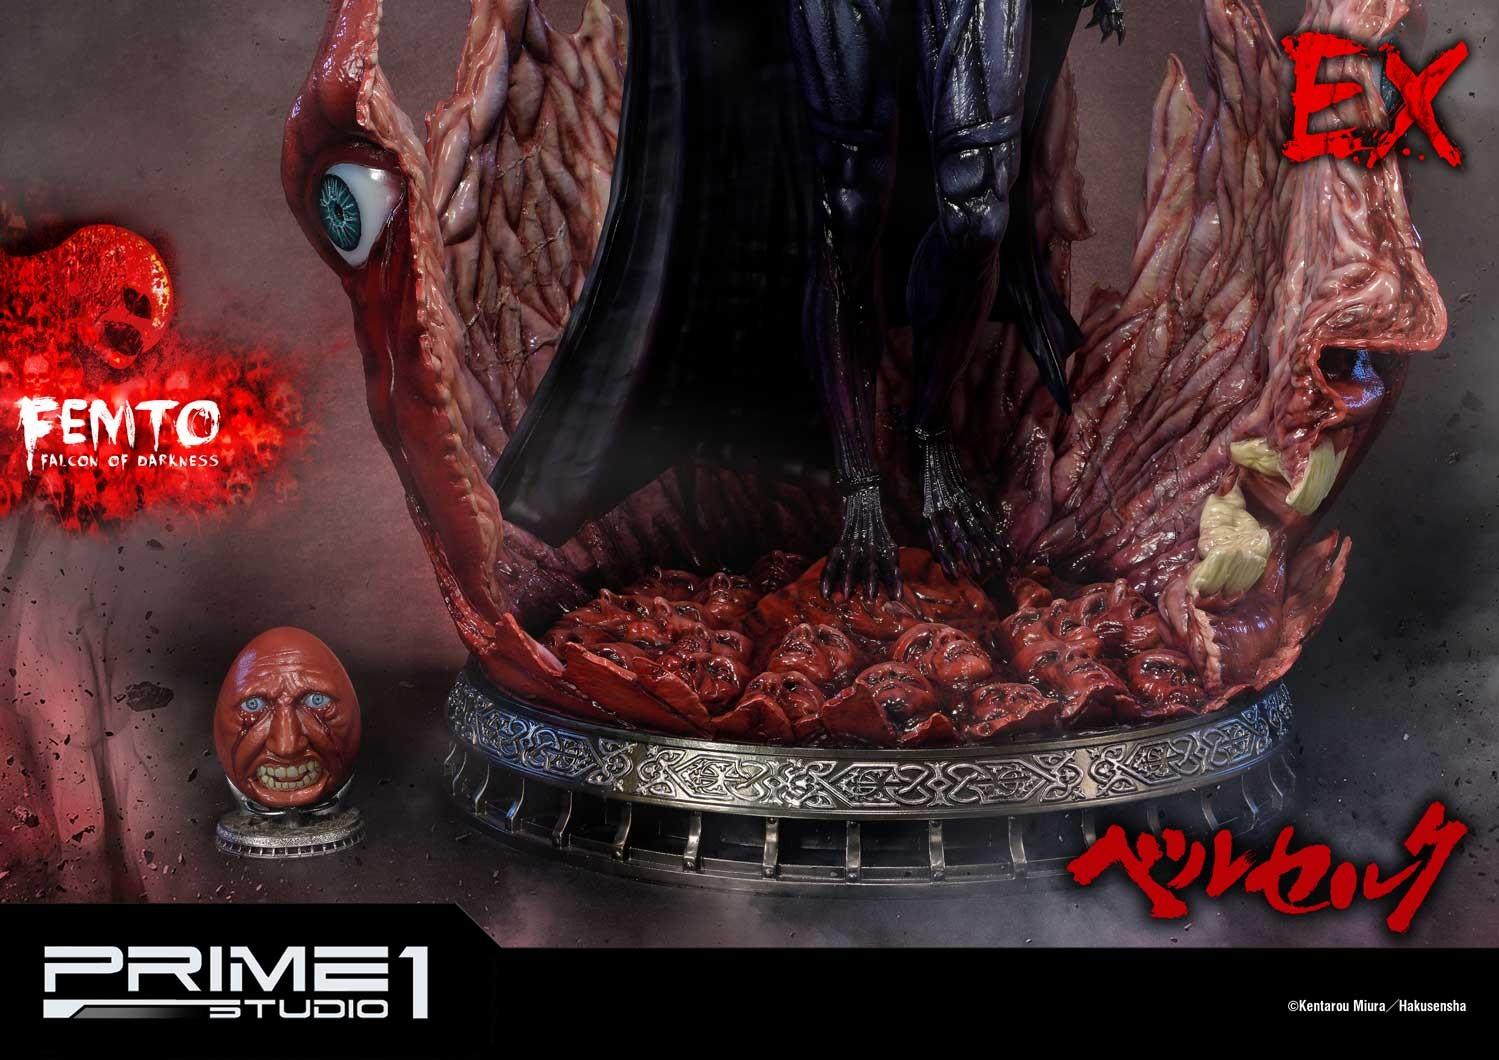 Link a Berserk Femto Falcon of Darkness Ultimate Premium Masterline Prime 1 Studio Itakon.it 10